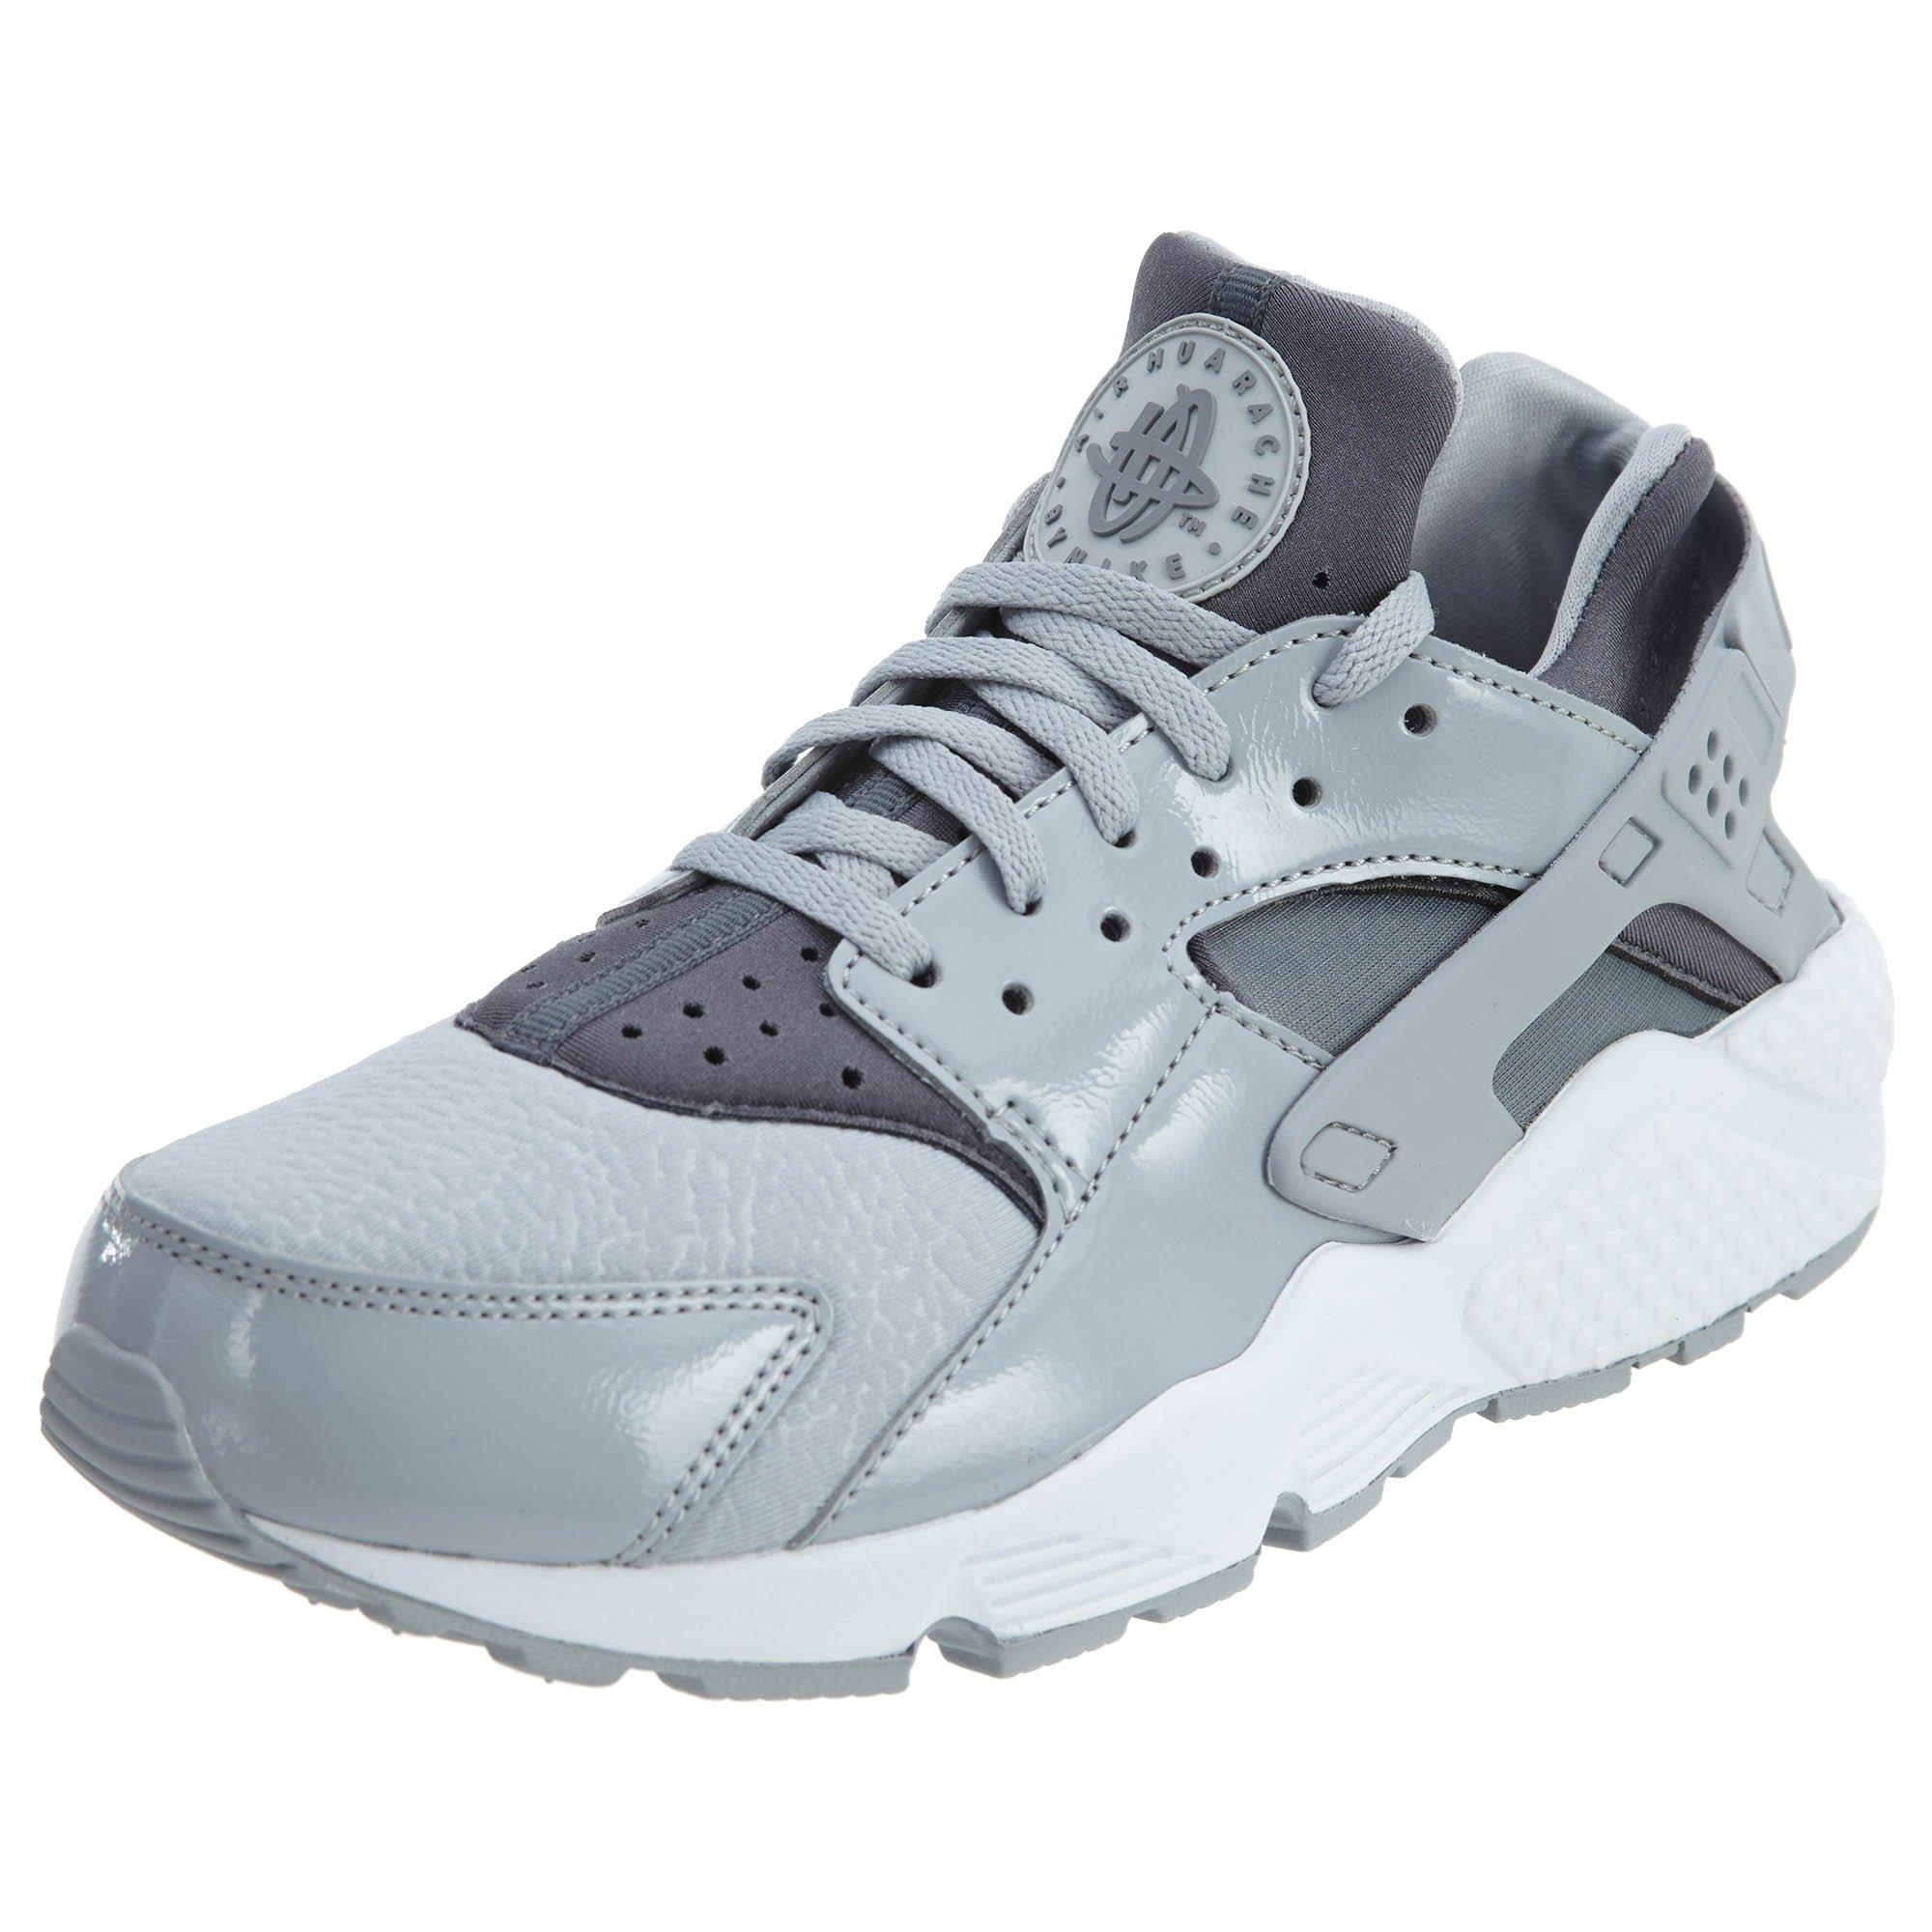 Nike Air Huarache Run Womens Shoes Wolf Grey/Cool Grey-Black 634835-023 (8 B(M) US)